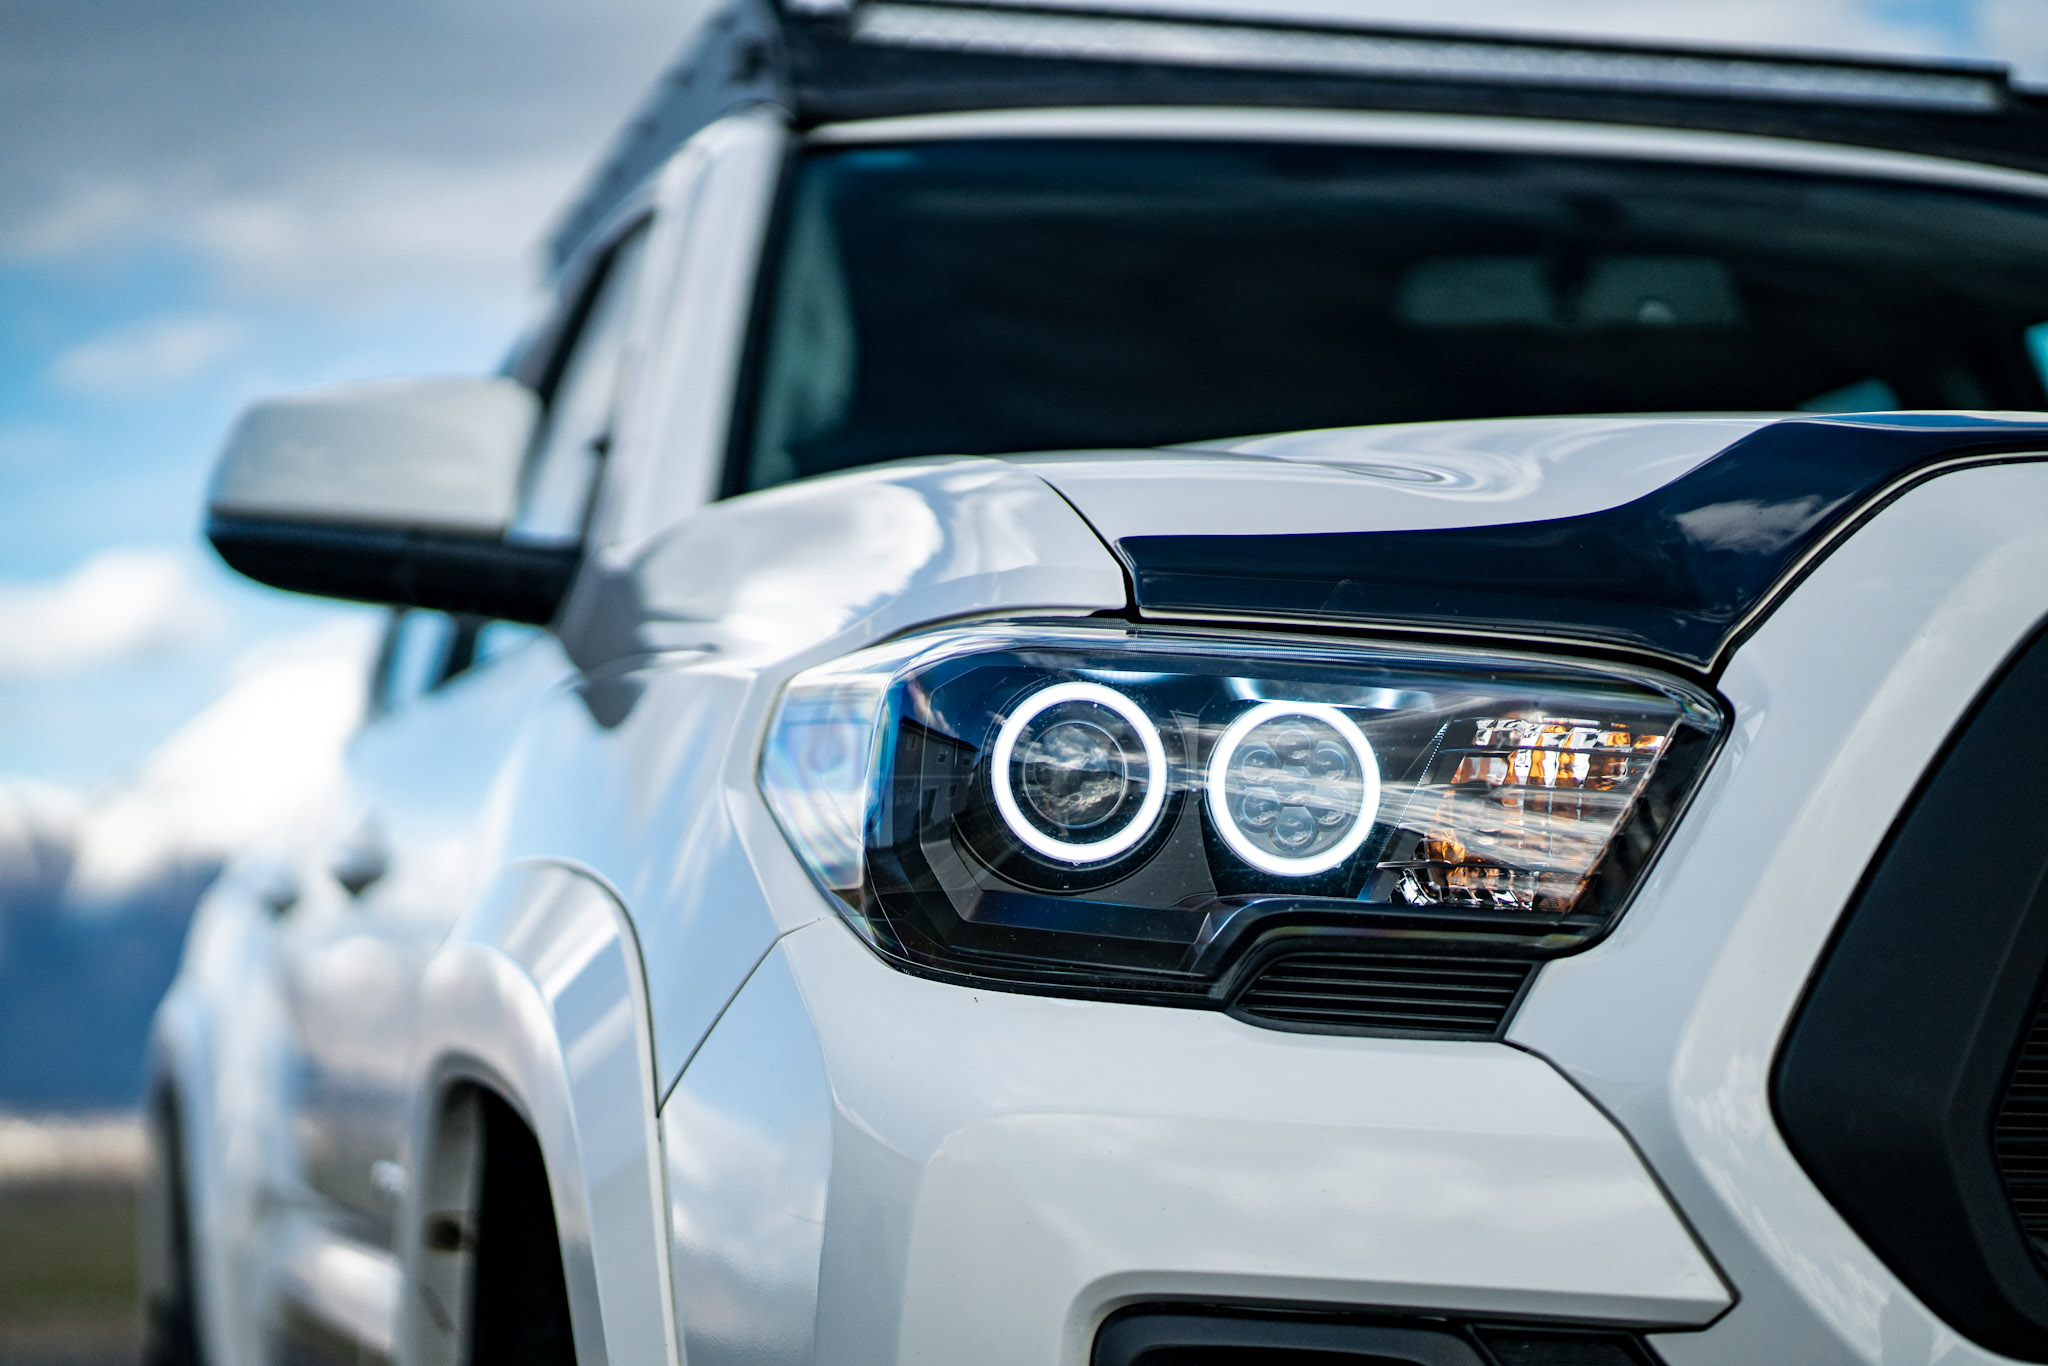 Top Headlight Options For The 3rd Gen Tacoma - Custom Retrofit